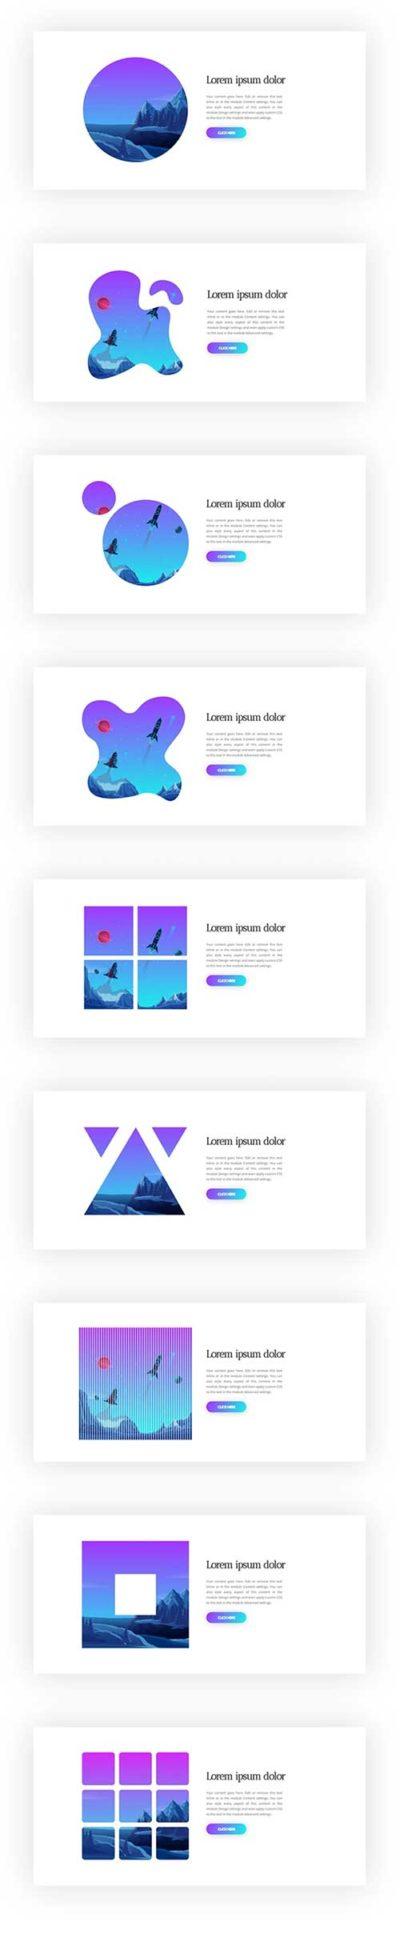 divi-image-overlay-shape-layouts